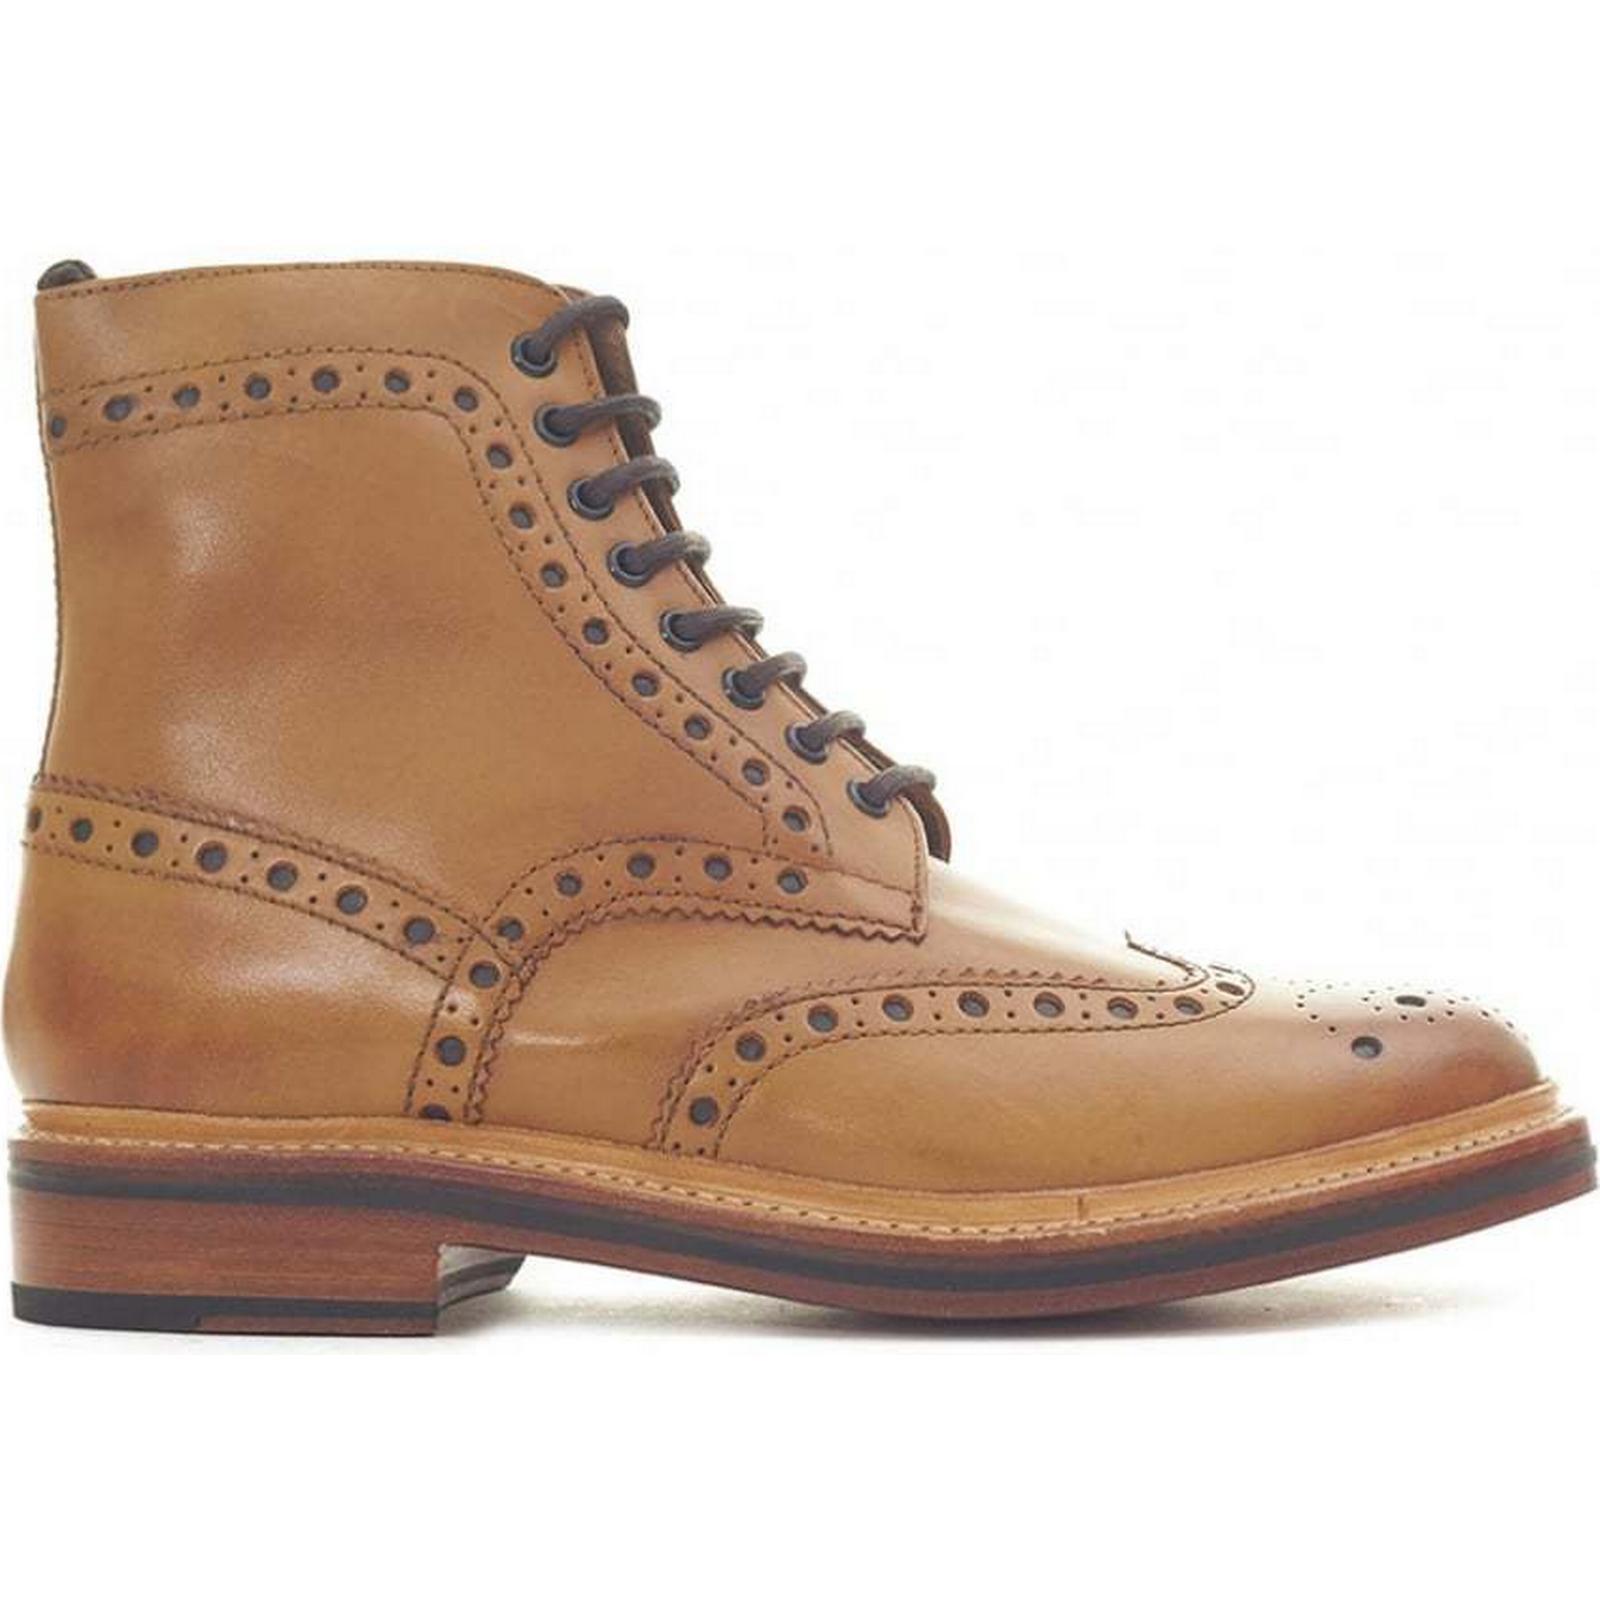 Grenson TAN, Fred Brogue Boots Colour: TAN, Grenson Size: 11 241db1